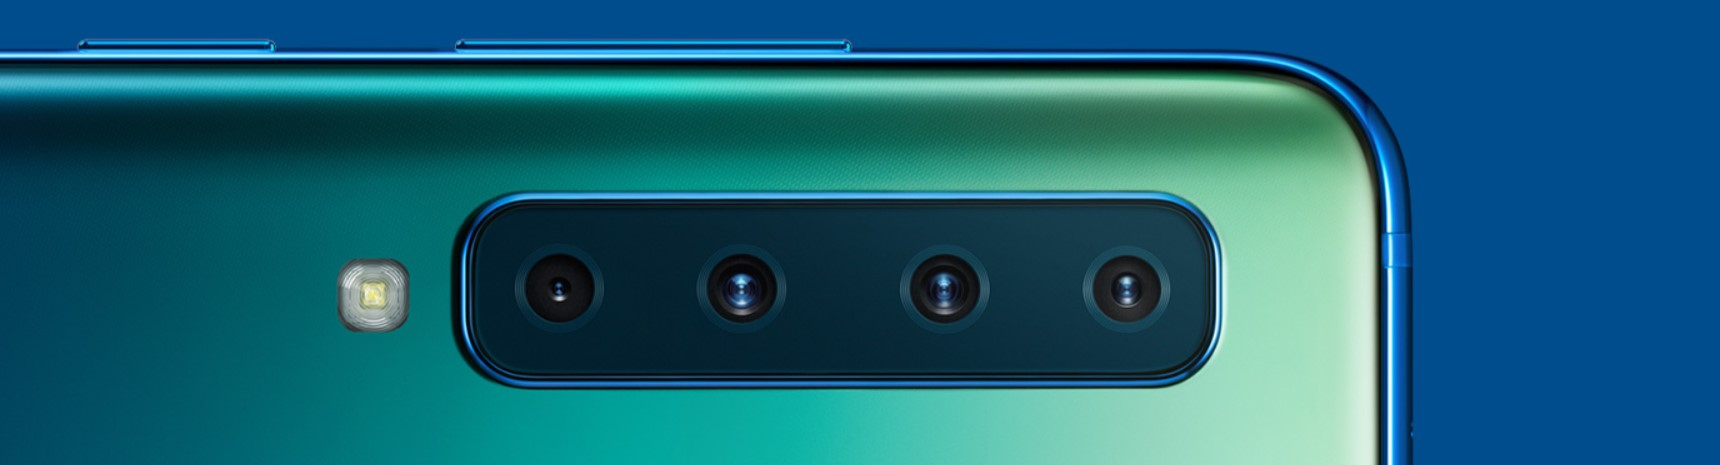 Samsung-a9-cztery-aparaty